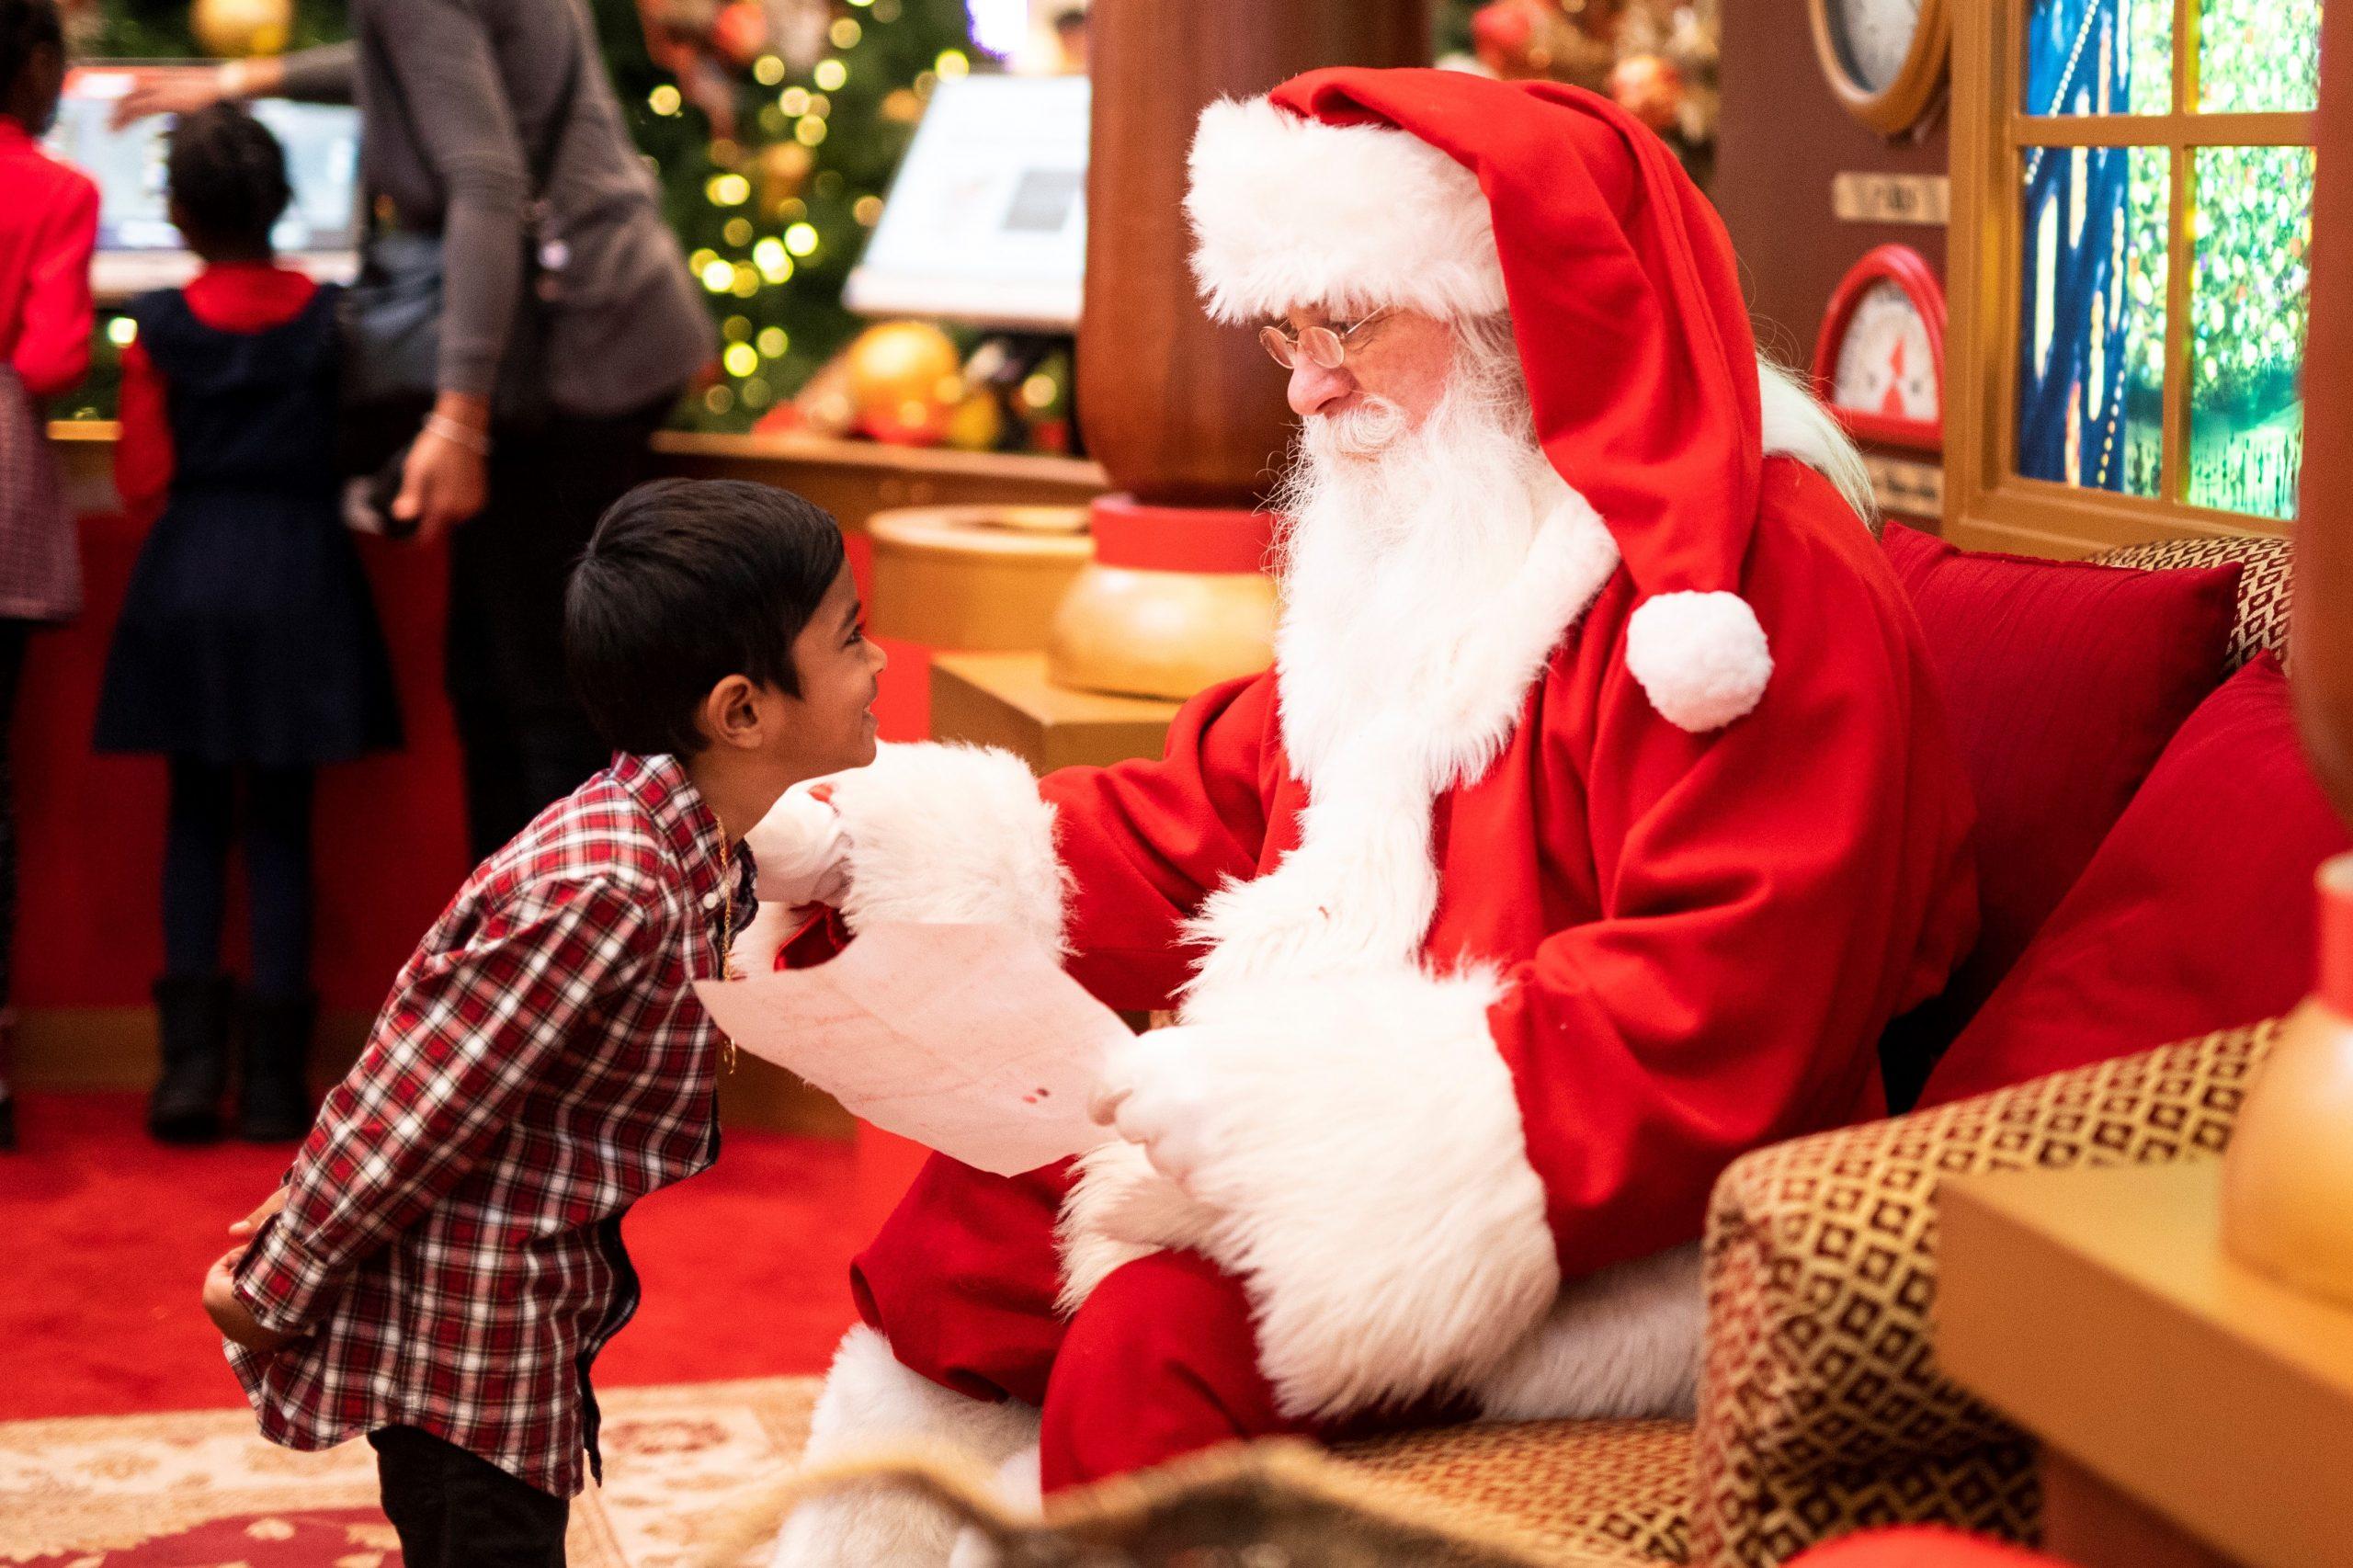 Covid 19 coronavirus: Santa Claus infects dozens at Belgium aged-care home